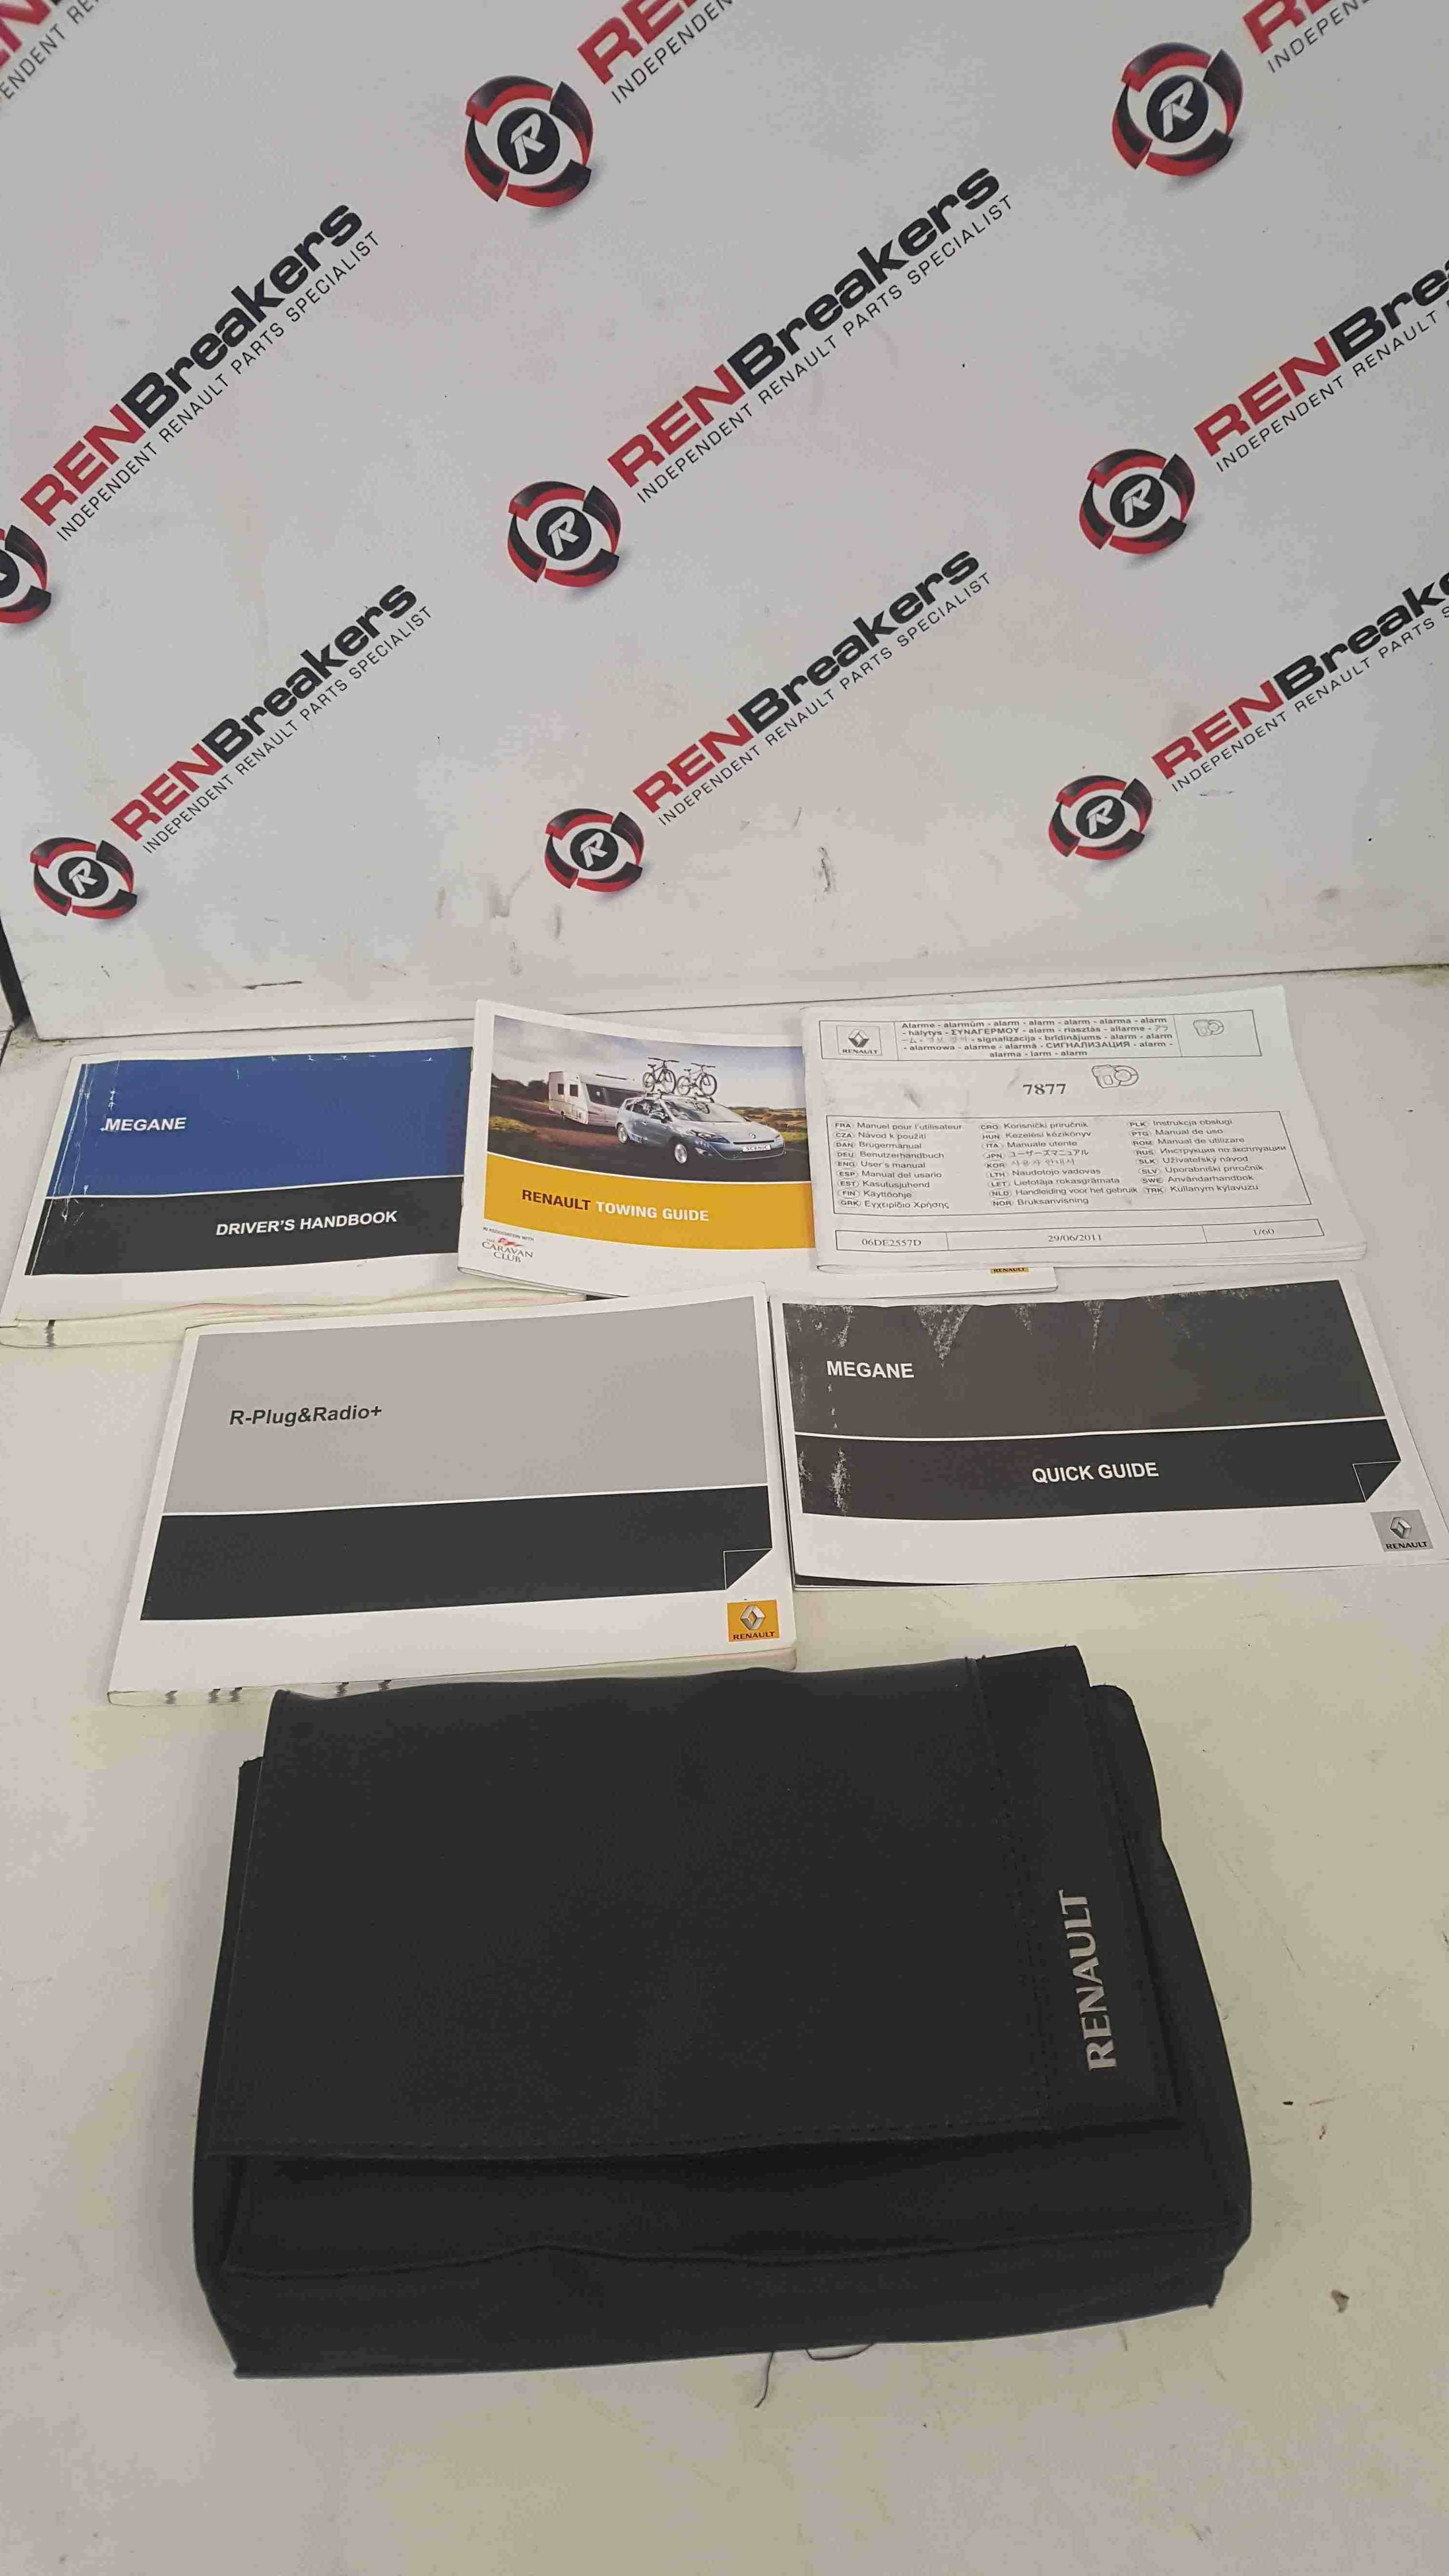 Renault Megane MK3 2008-2012 Handbook Documents Guides Booklet